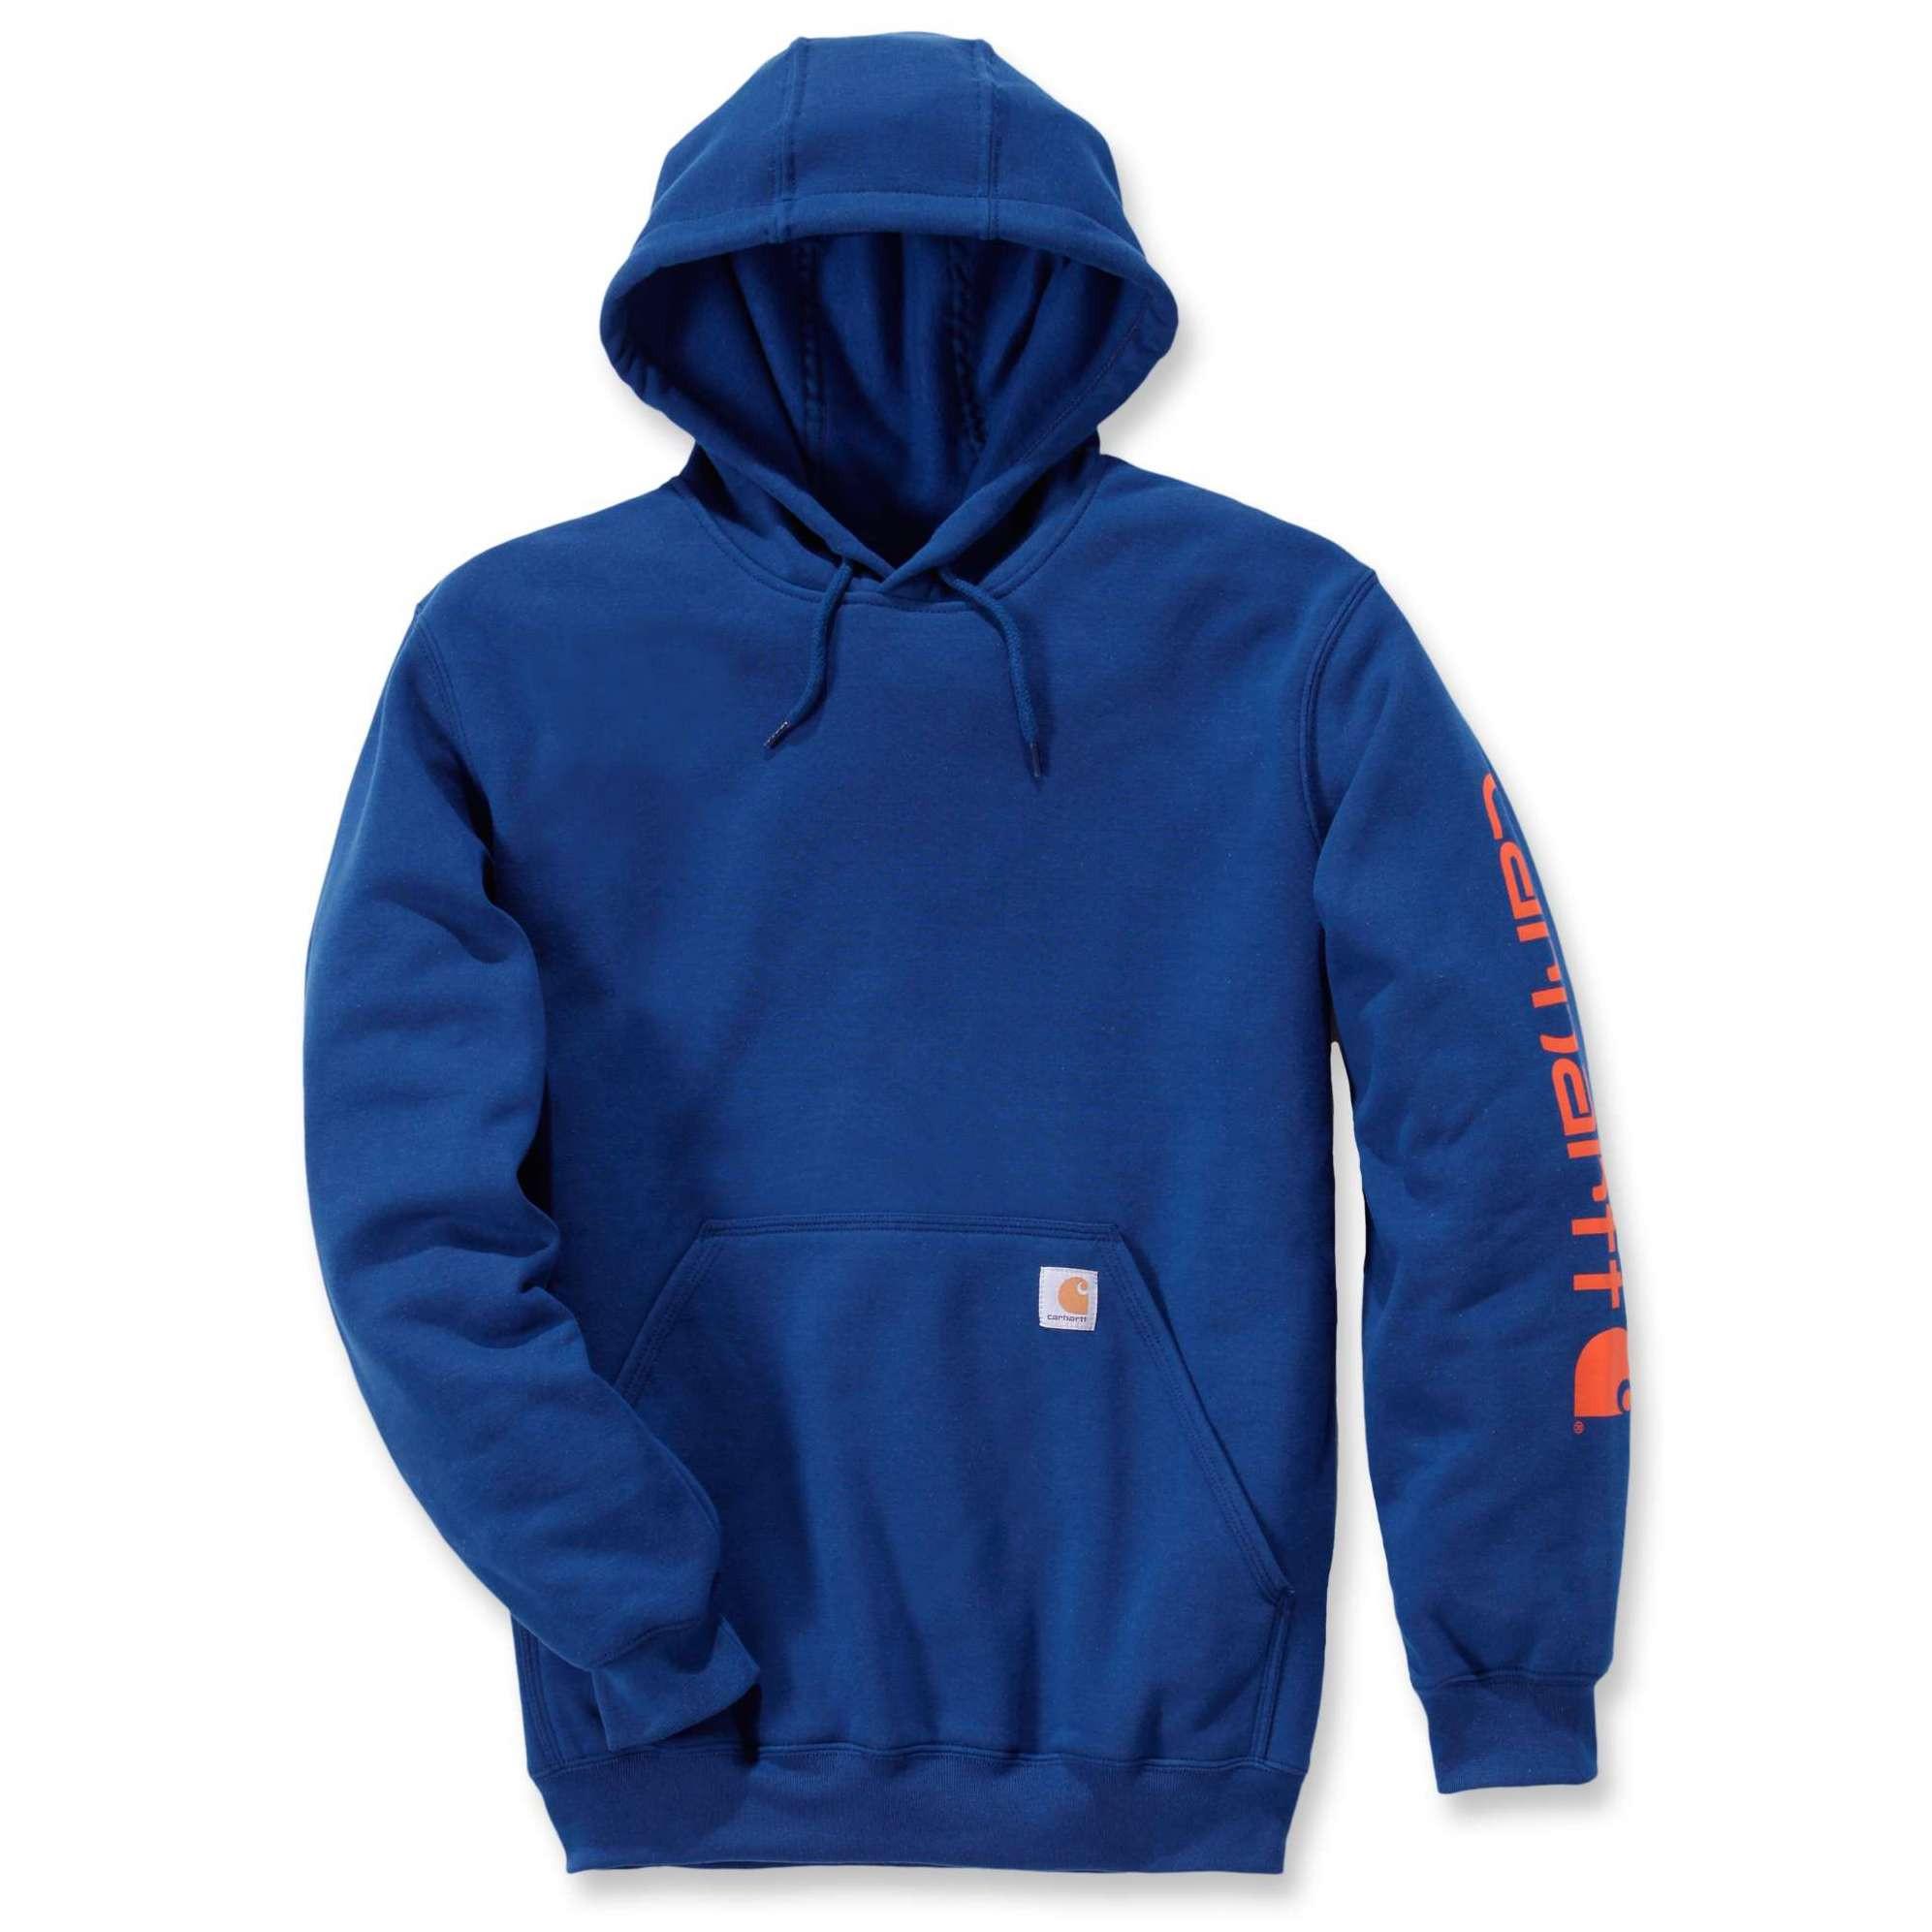 Худи Carhartt Sleeve Logo Hooded Sweatshirt - K288 (Superior Blue, XS)